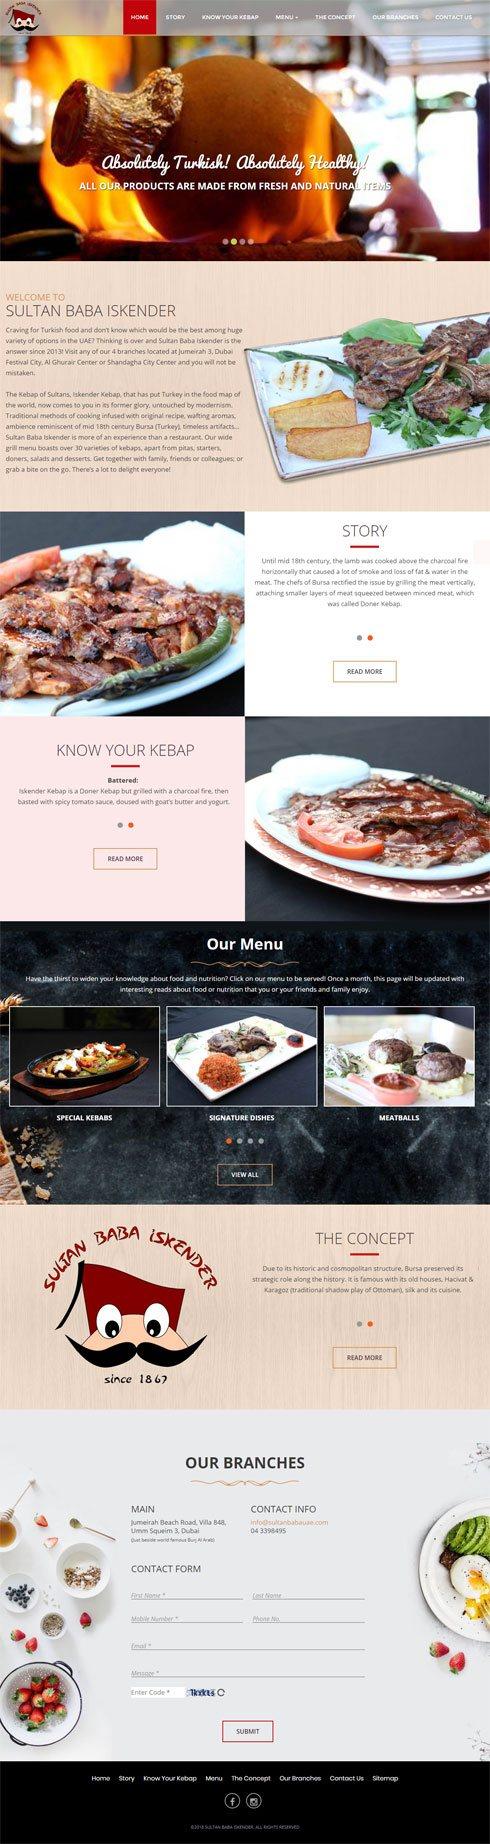 Sultan Baba Iskender United Arab Emirates Web Design